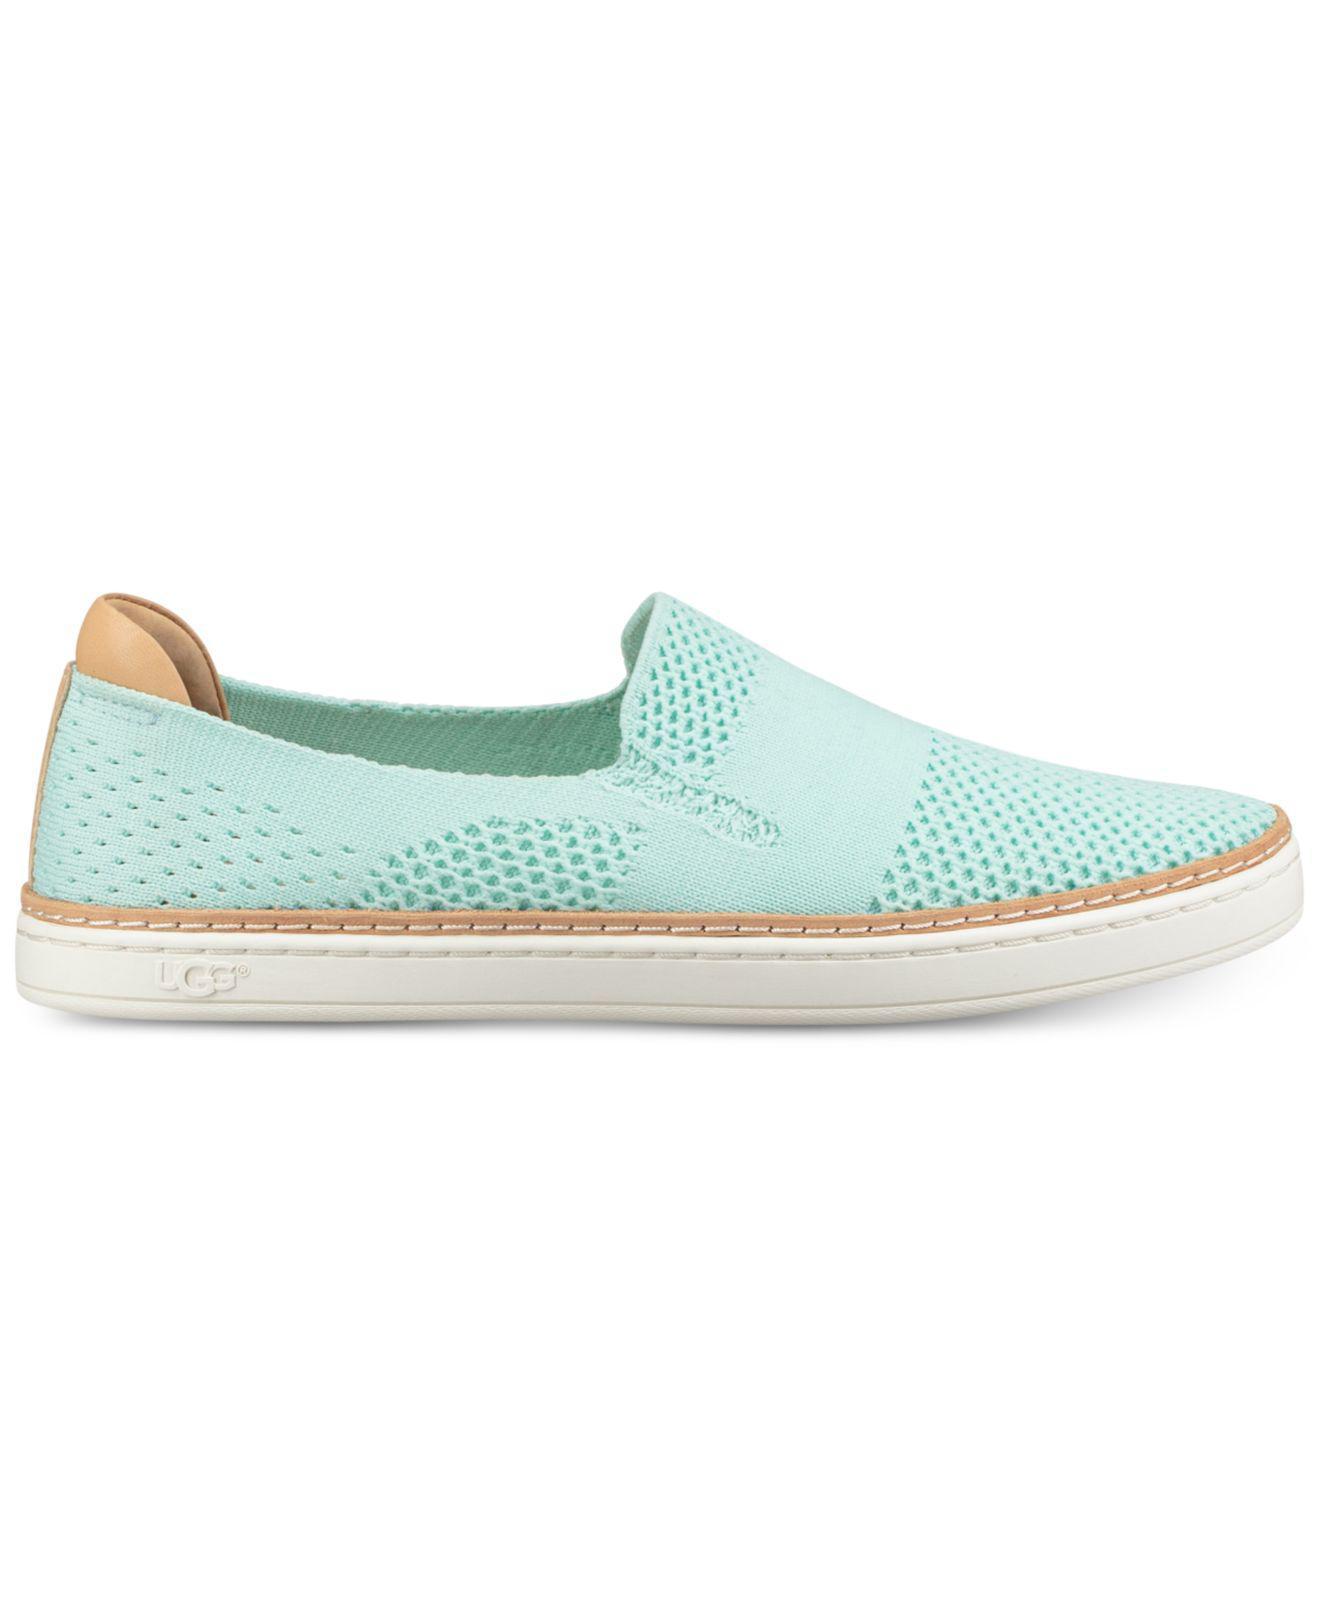 ee283d14eae Ugg Blue Sammy Slip-on Sneakers